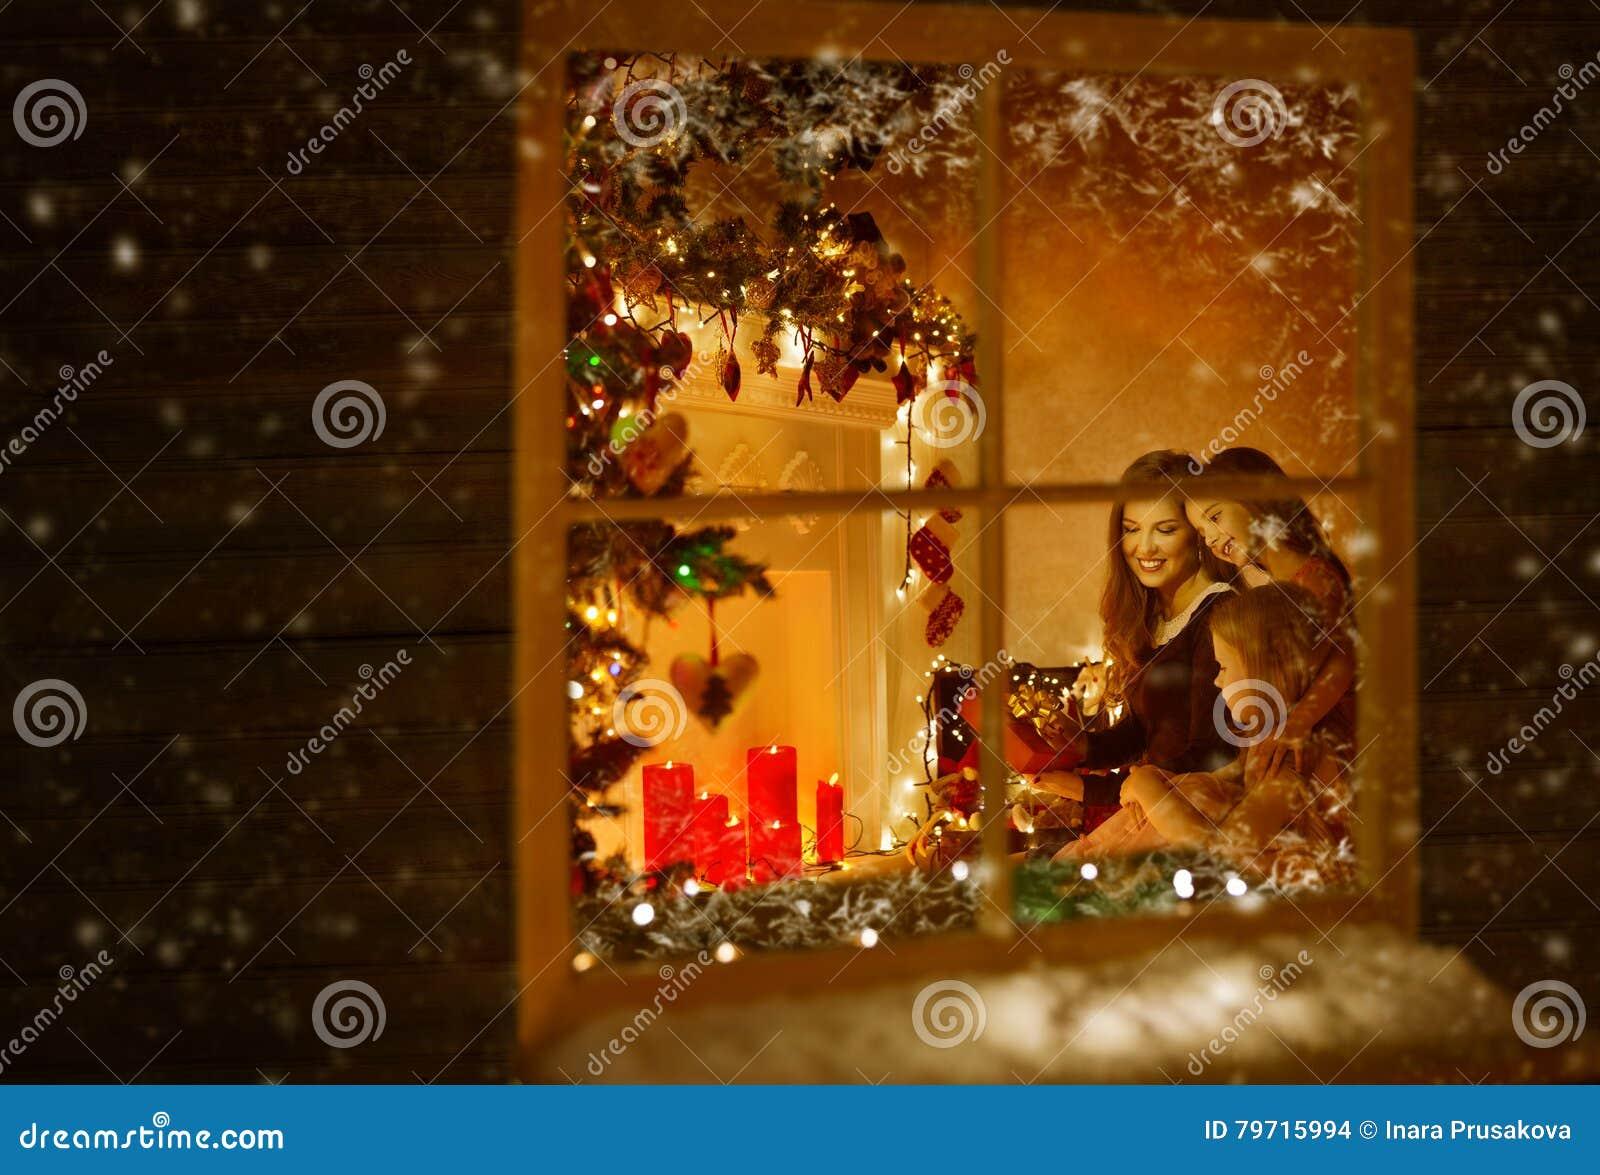 Christmas Window, Family Celebrating Holiday, Winter Night House